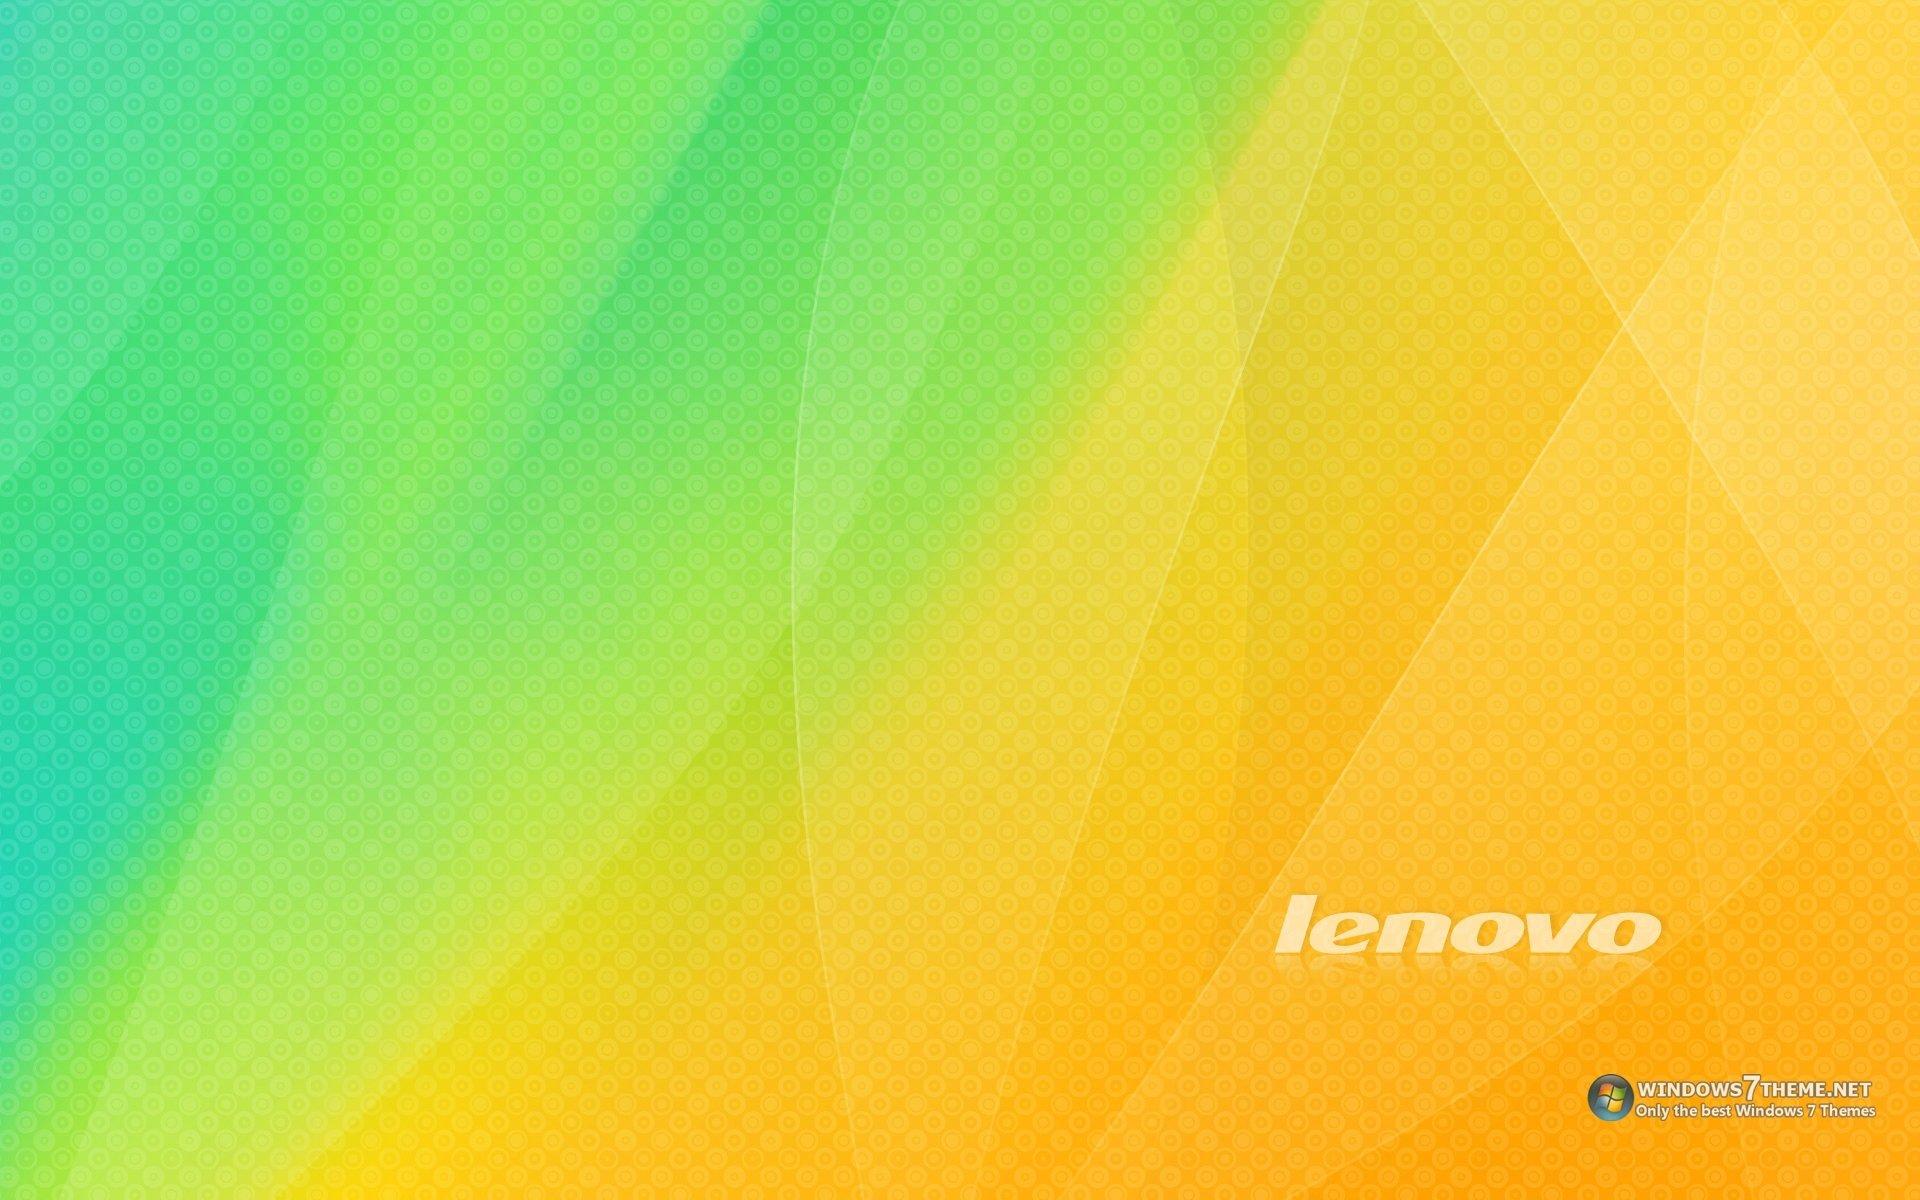 Ноутбук Lenovo IdeaPad 320-15ISK 80XH01F8RK (Intel Core i3-6006U 2.0 GHz/4096Mb/500Gb/Intel HD Graphics/Wi-Fi/Bluetooth/Cam/15.6/1920x1080/DOS)